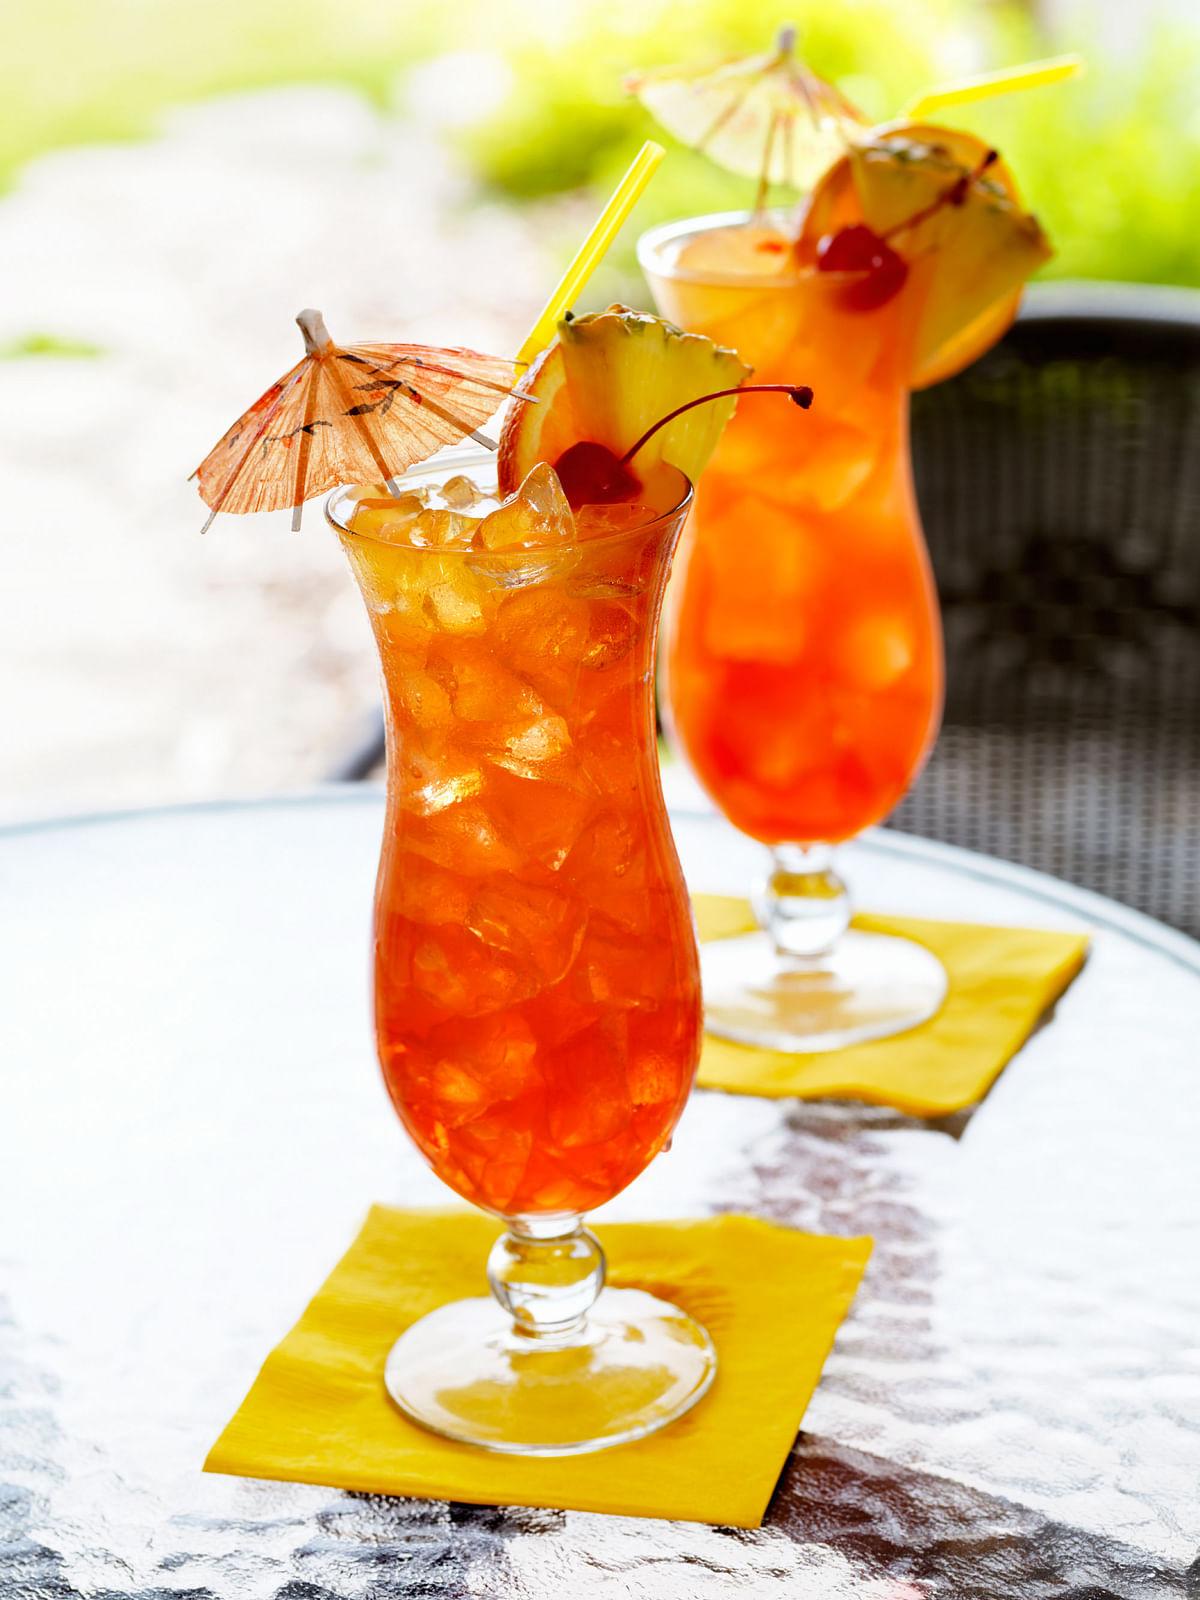 Mai Tai is a fresh fruity cocktail. (Photo: iStockphoto)